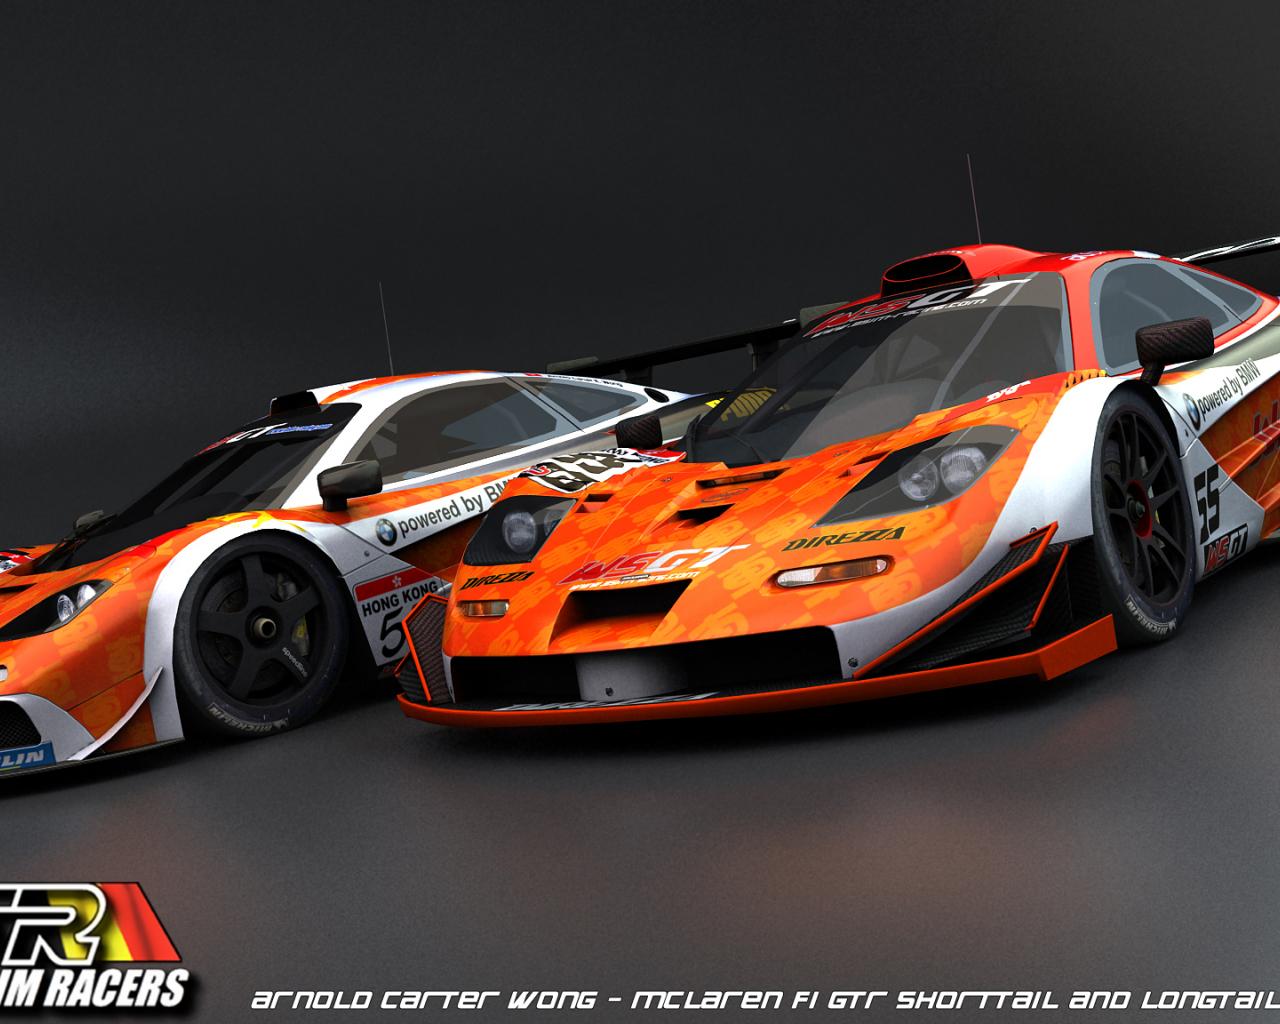 Free download New McLaren F1 GTR background F1 wallpapers ...